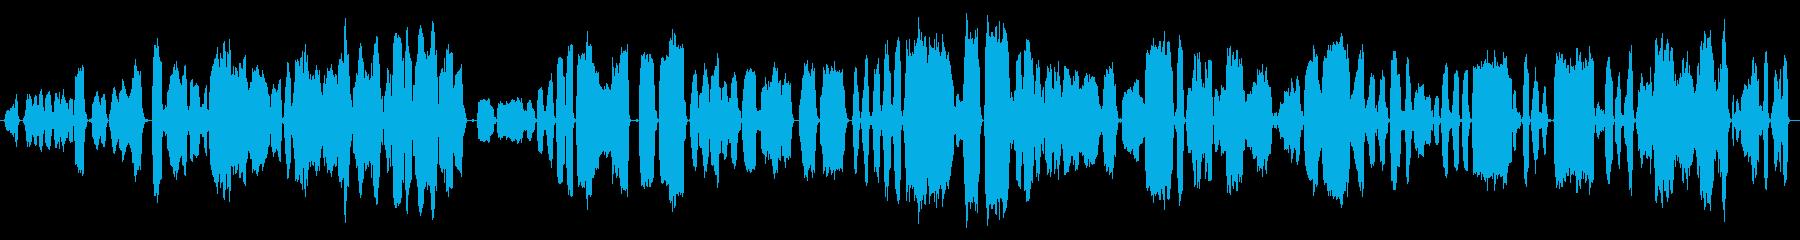 CALLIOPE、BARREL O...の再生済みの波形